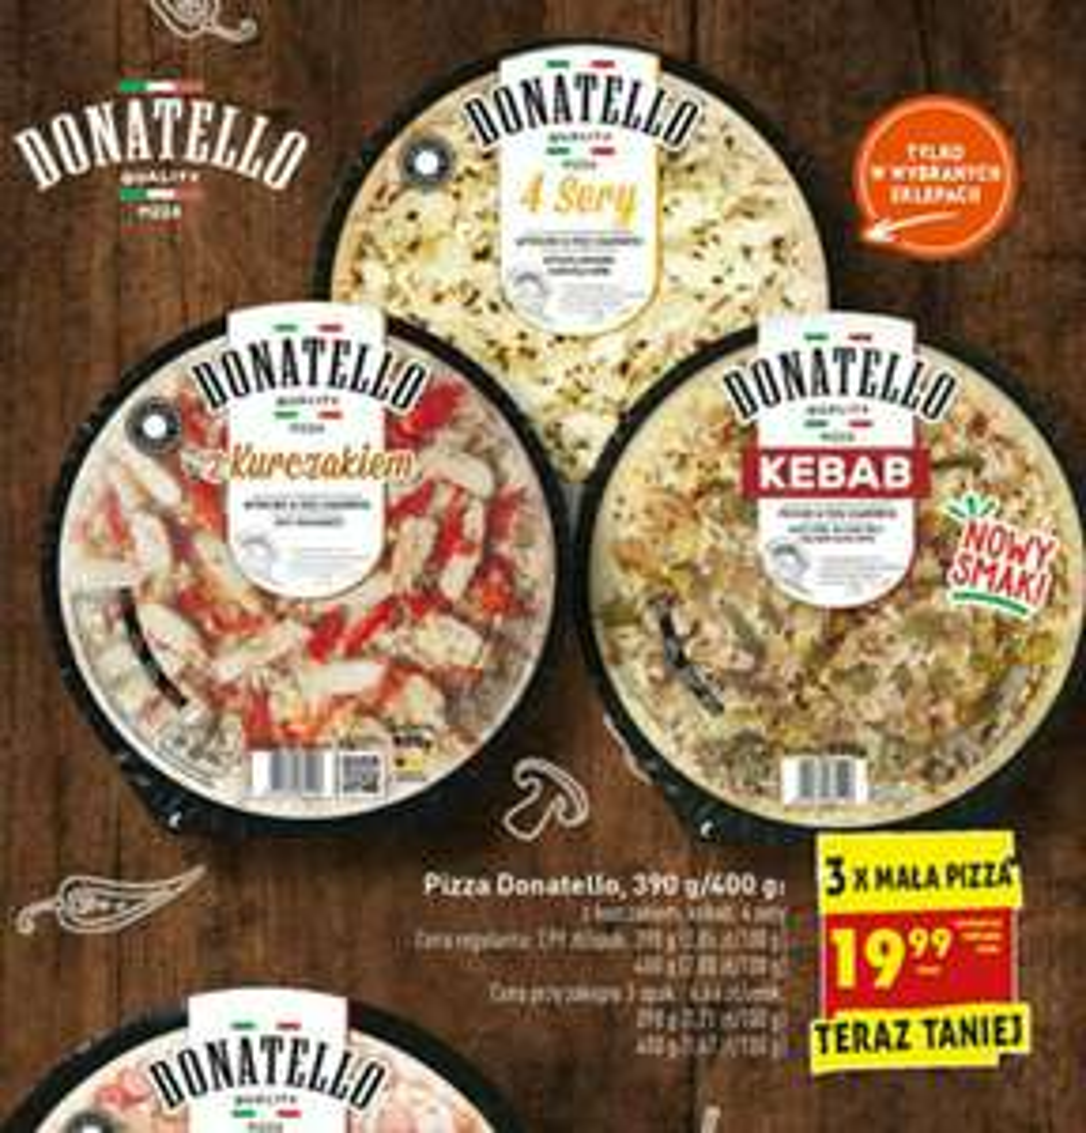 Pizza Donatello biedronka 3x za 19.99